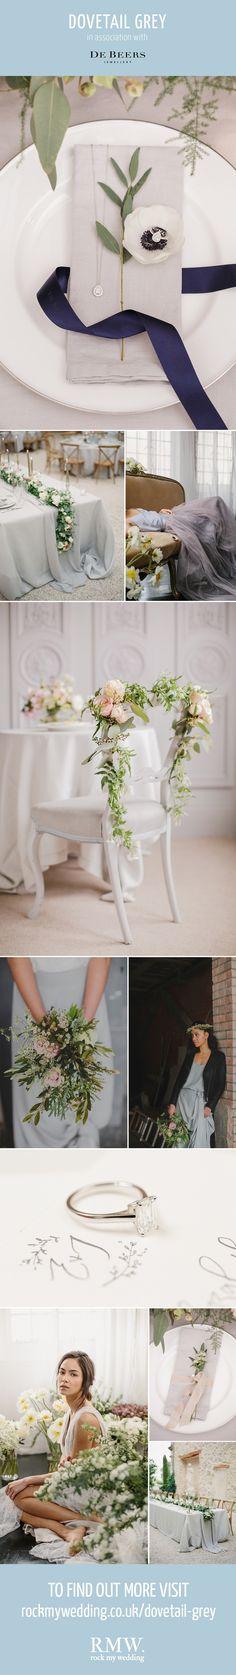 Dovetail Grey Wedding Inspiration   http://www.rockmywedding.co.uk/dovetail-grey/